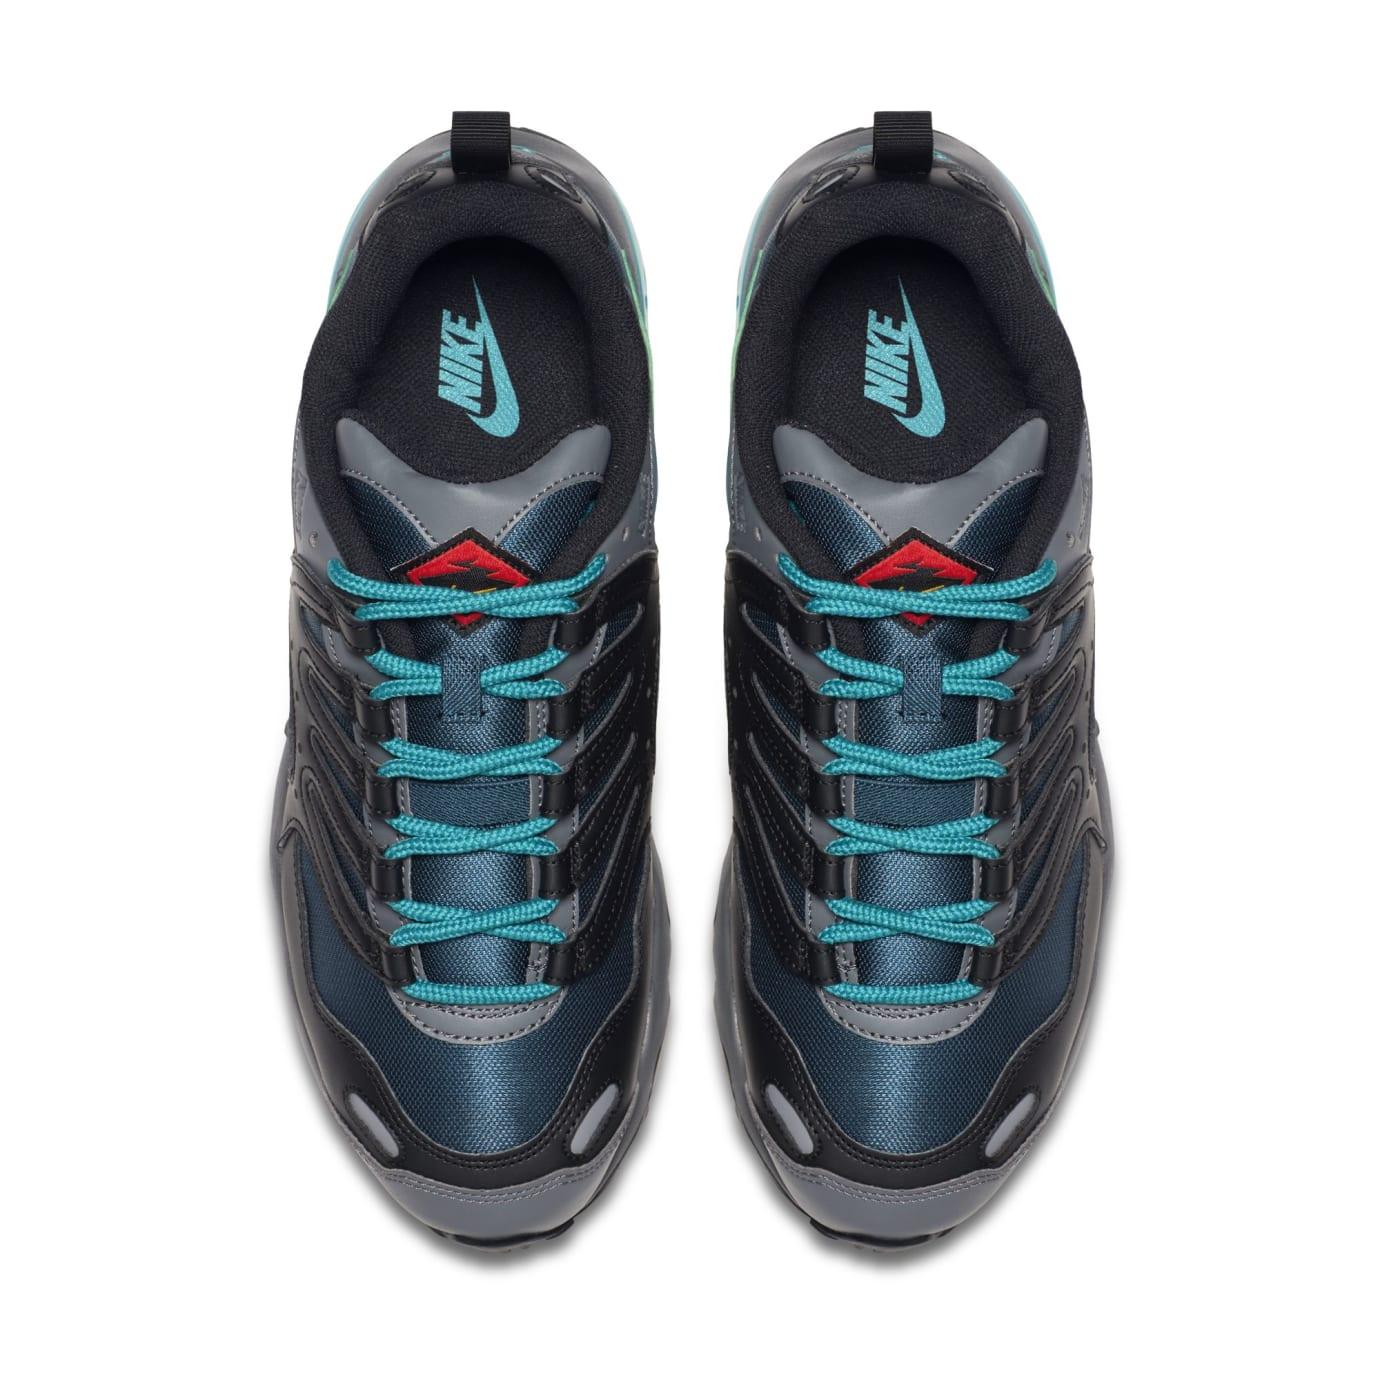 brand new 6c830 666bb Image via US11 · Nike Air Terra Humara 18 GreyTeal (Top)